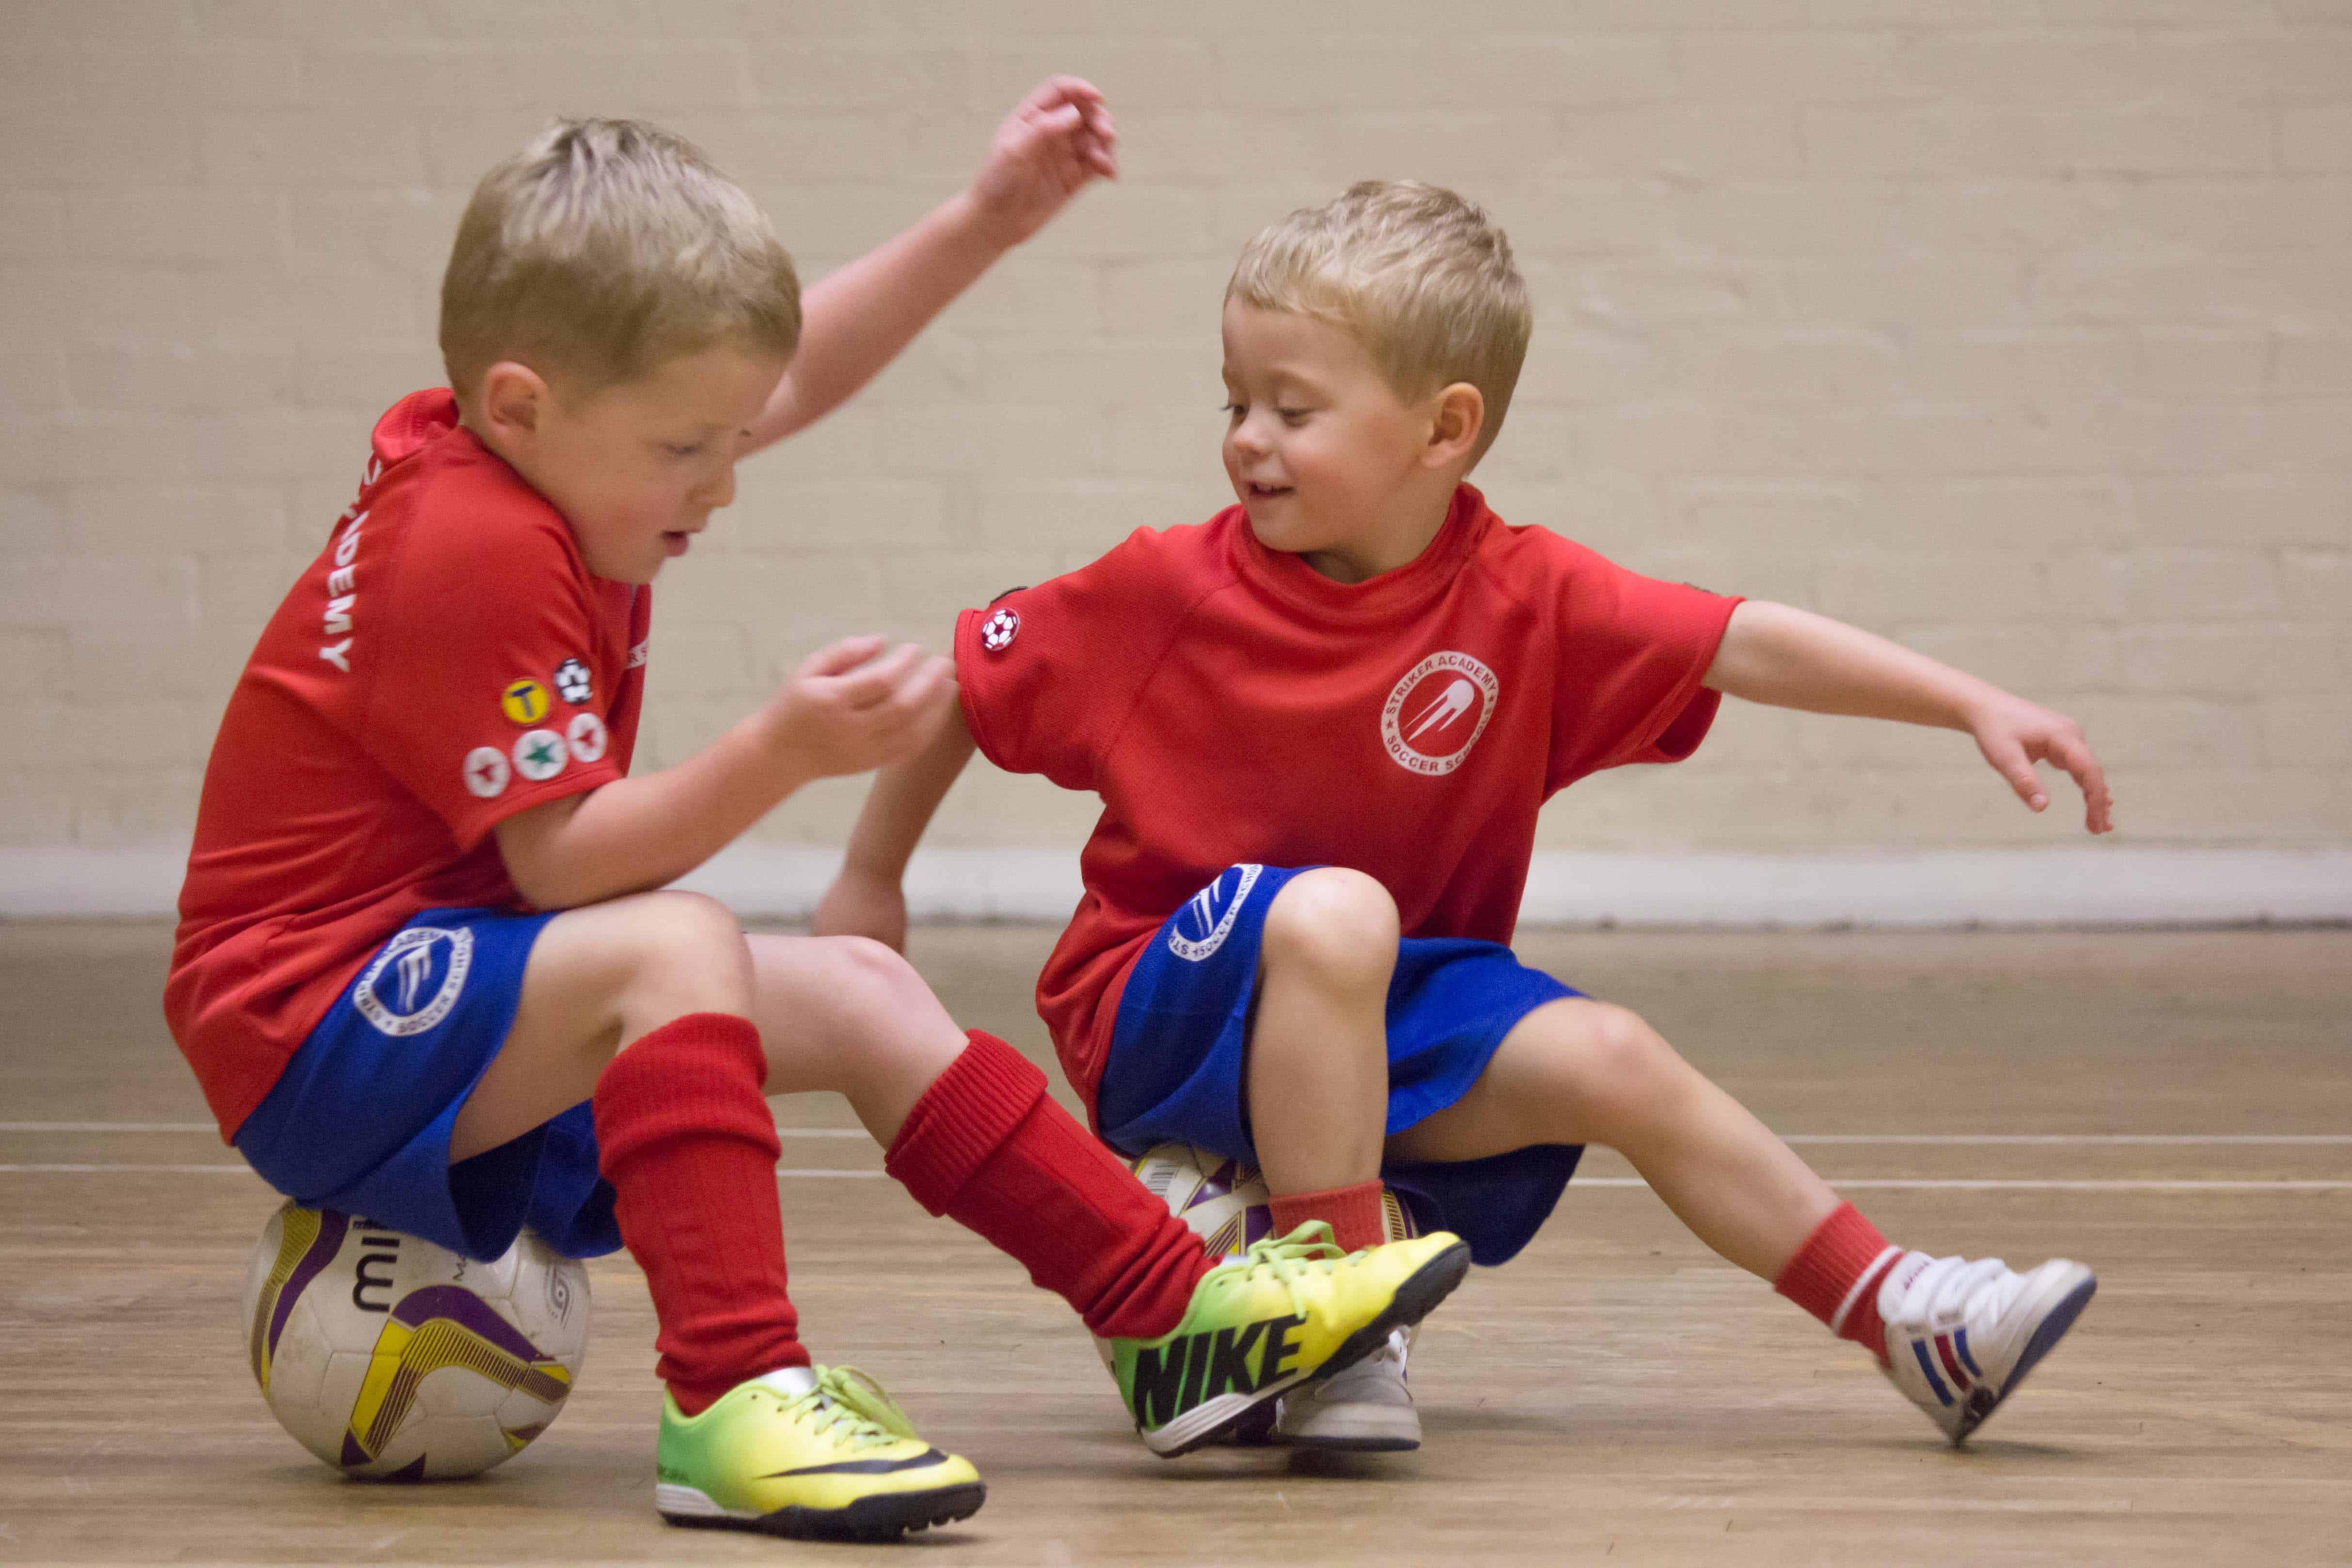 Stirker Academy Mini Strikers using their footballs to balance